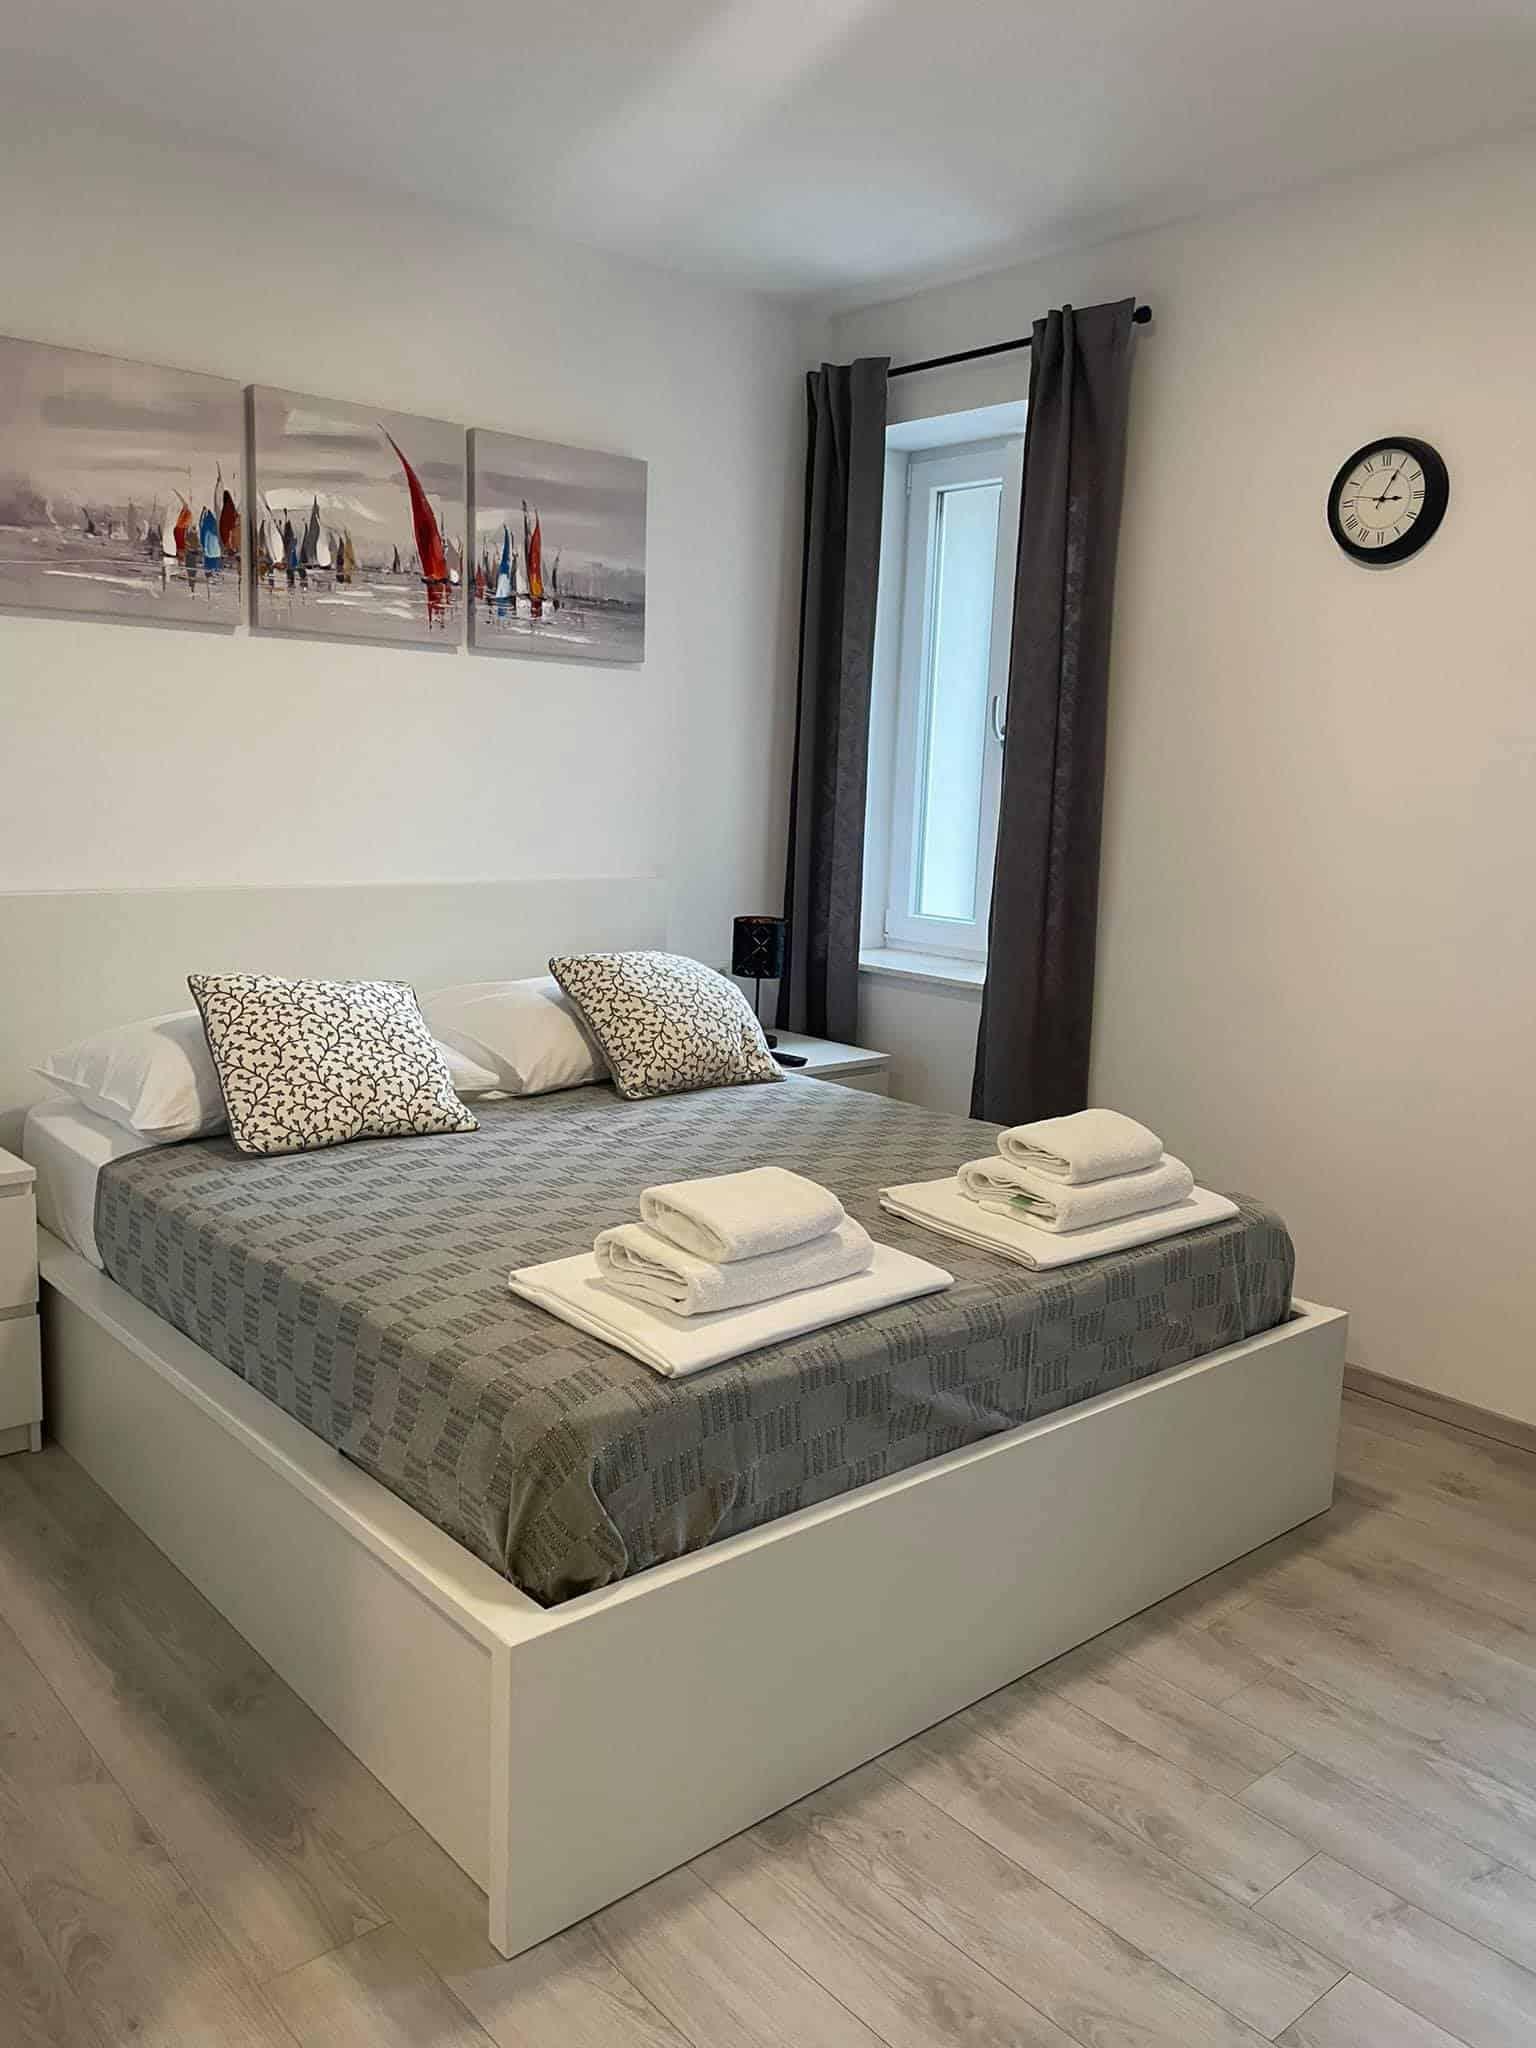 Sibenik boasts accommodation options for every budget